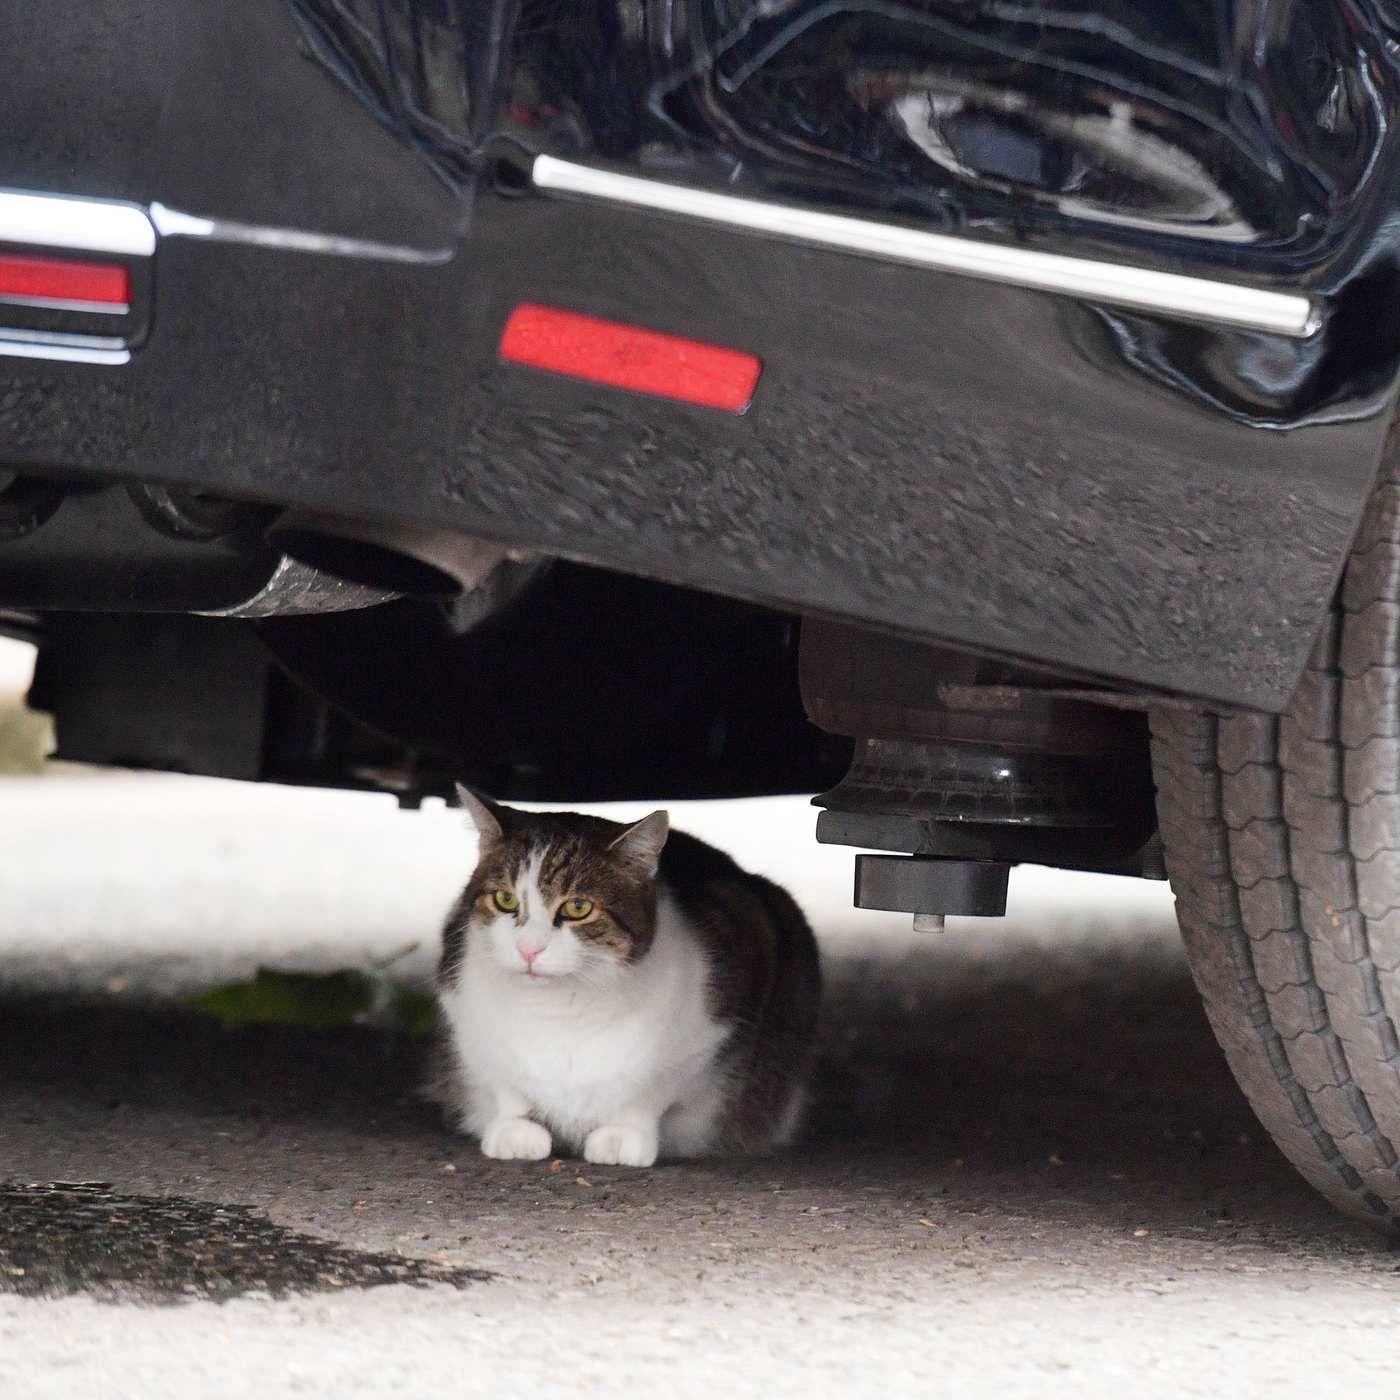 Beloved british cat joins antitrump protests cat hiding